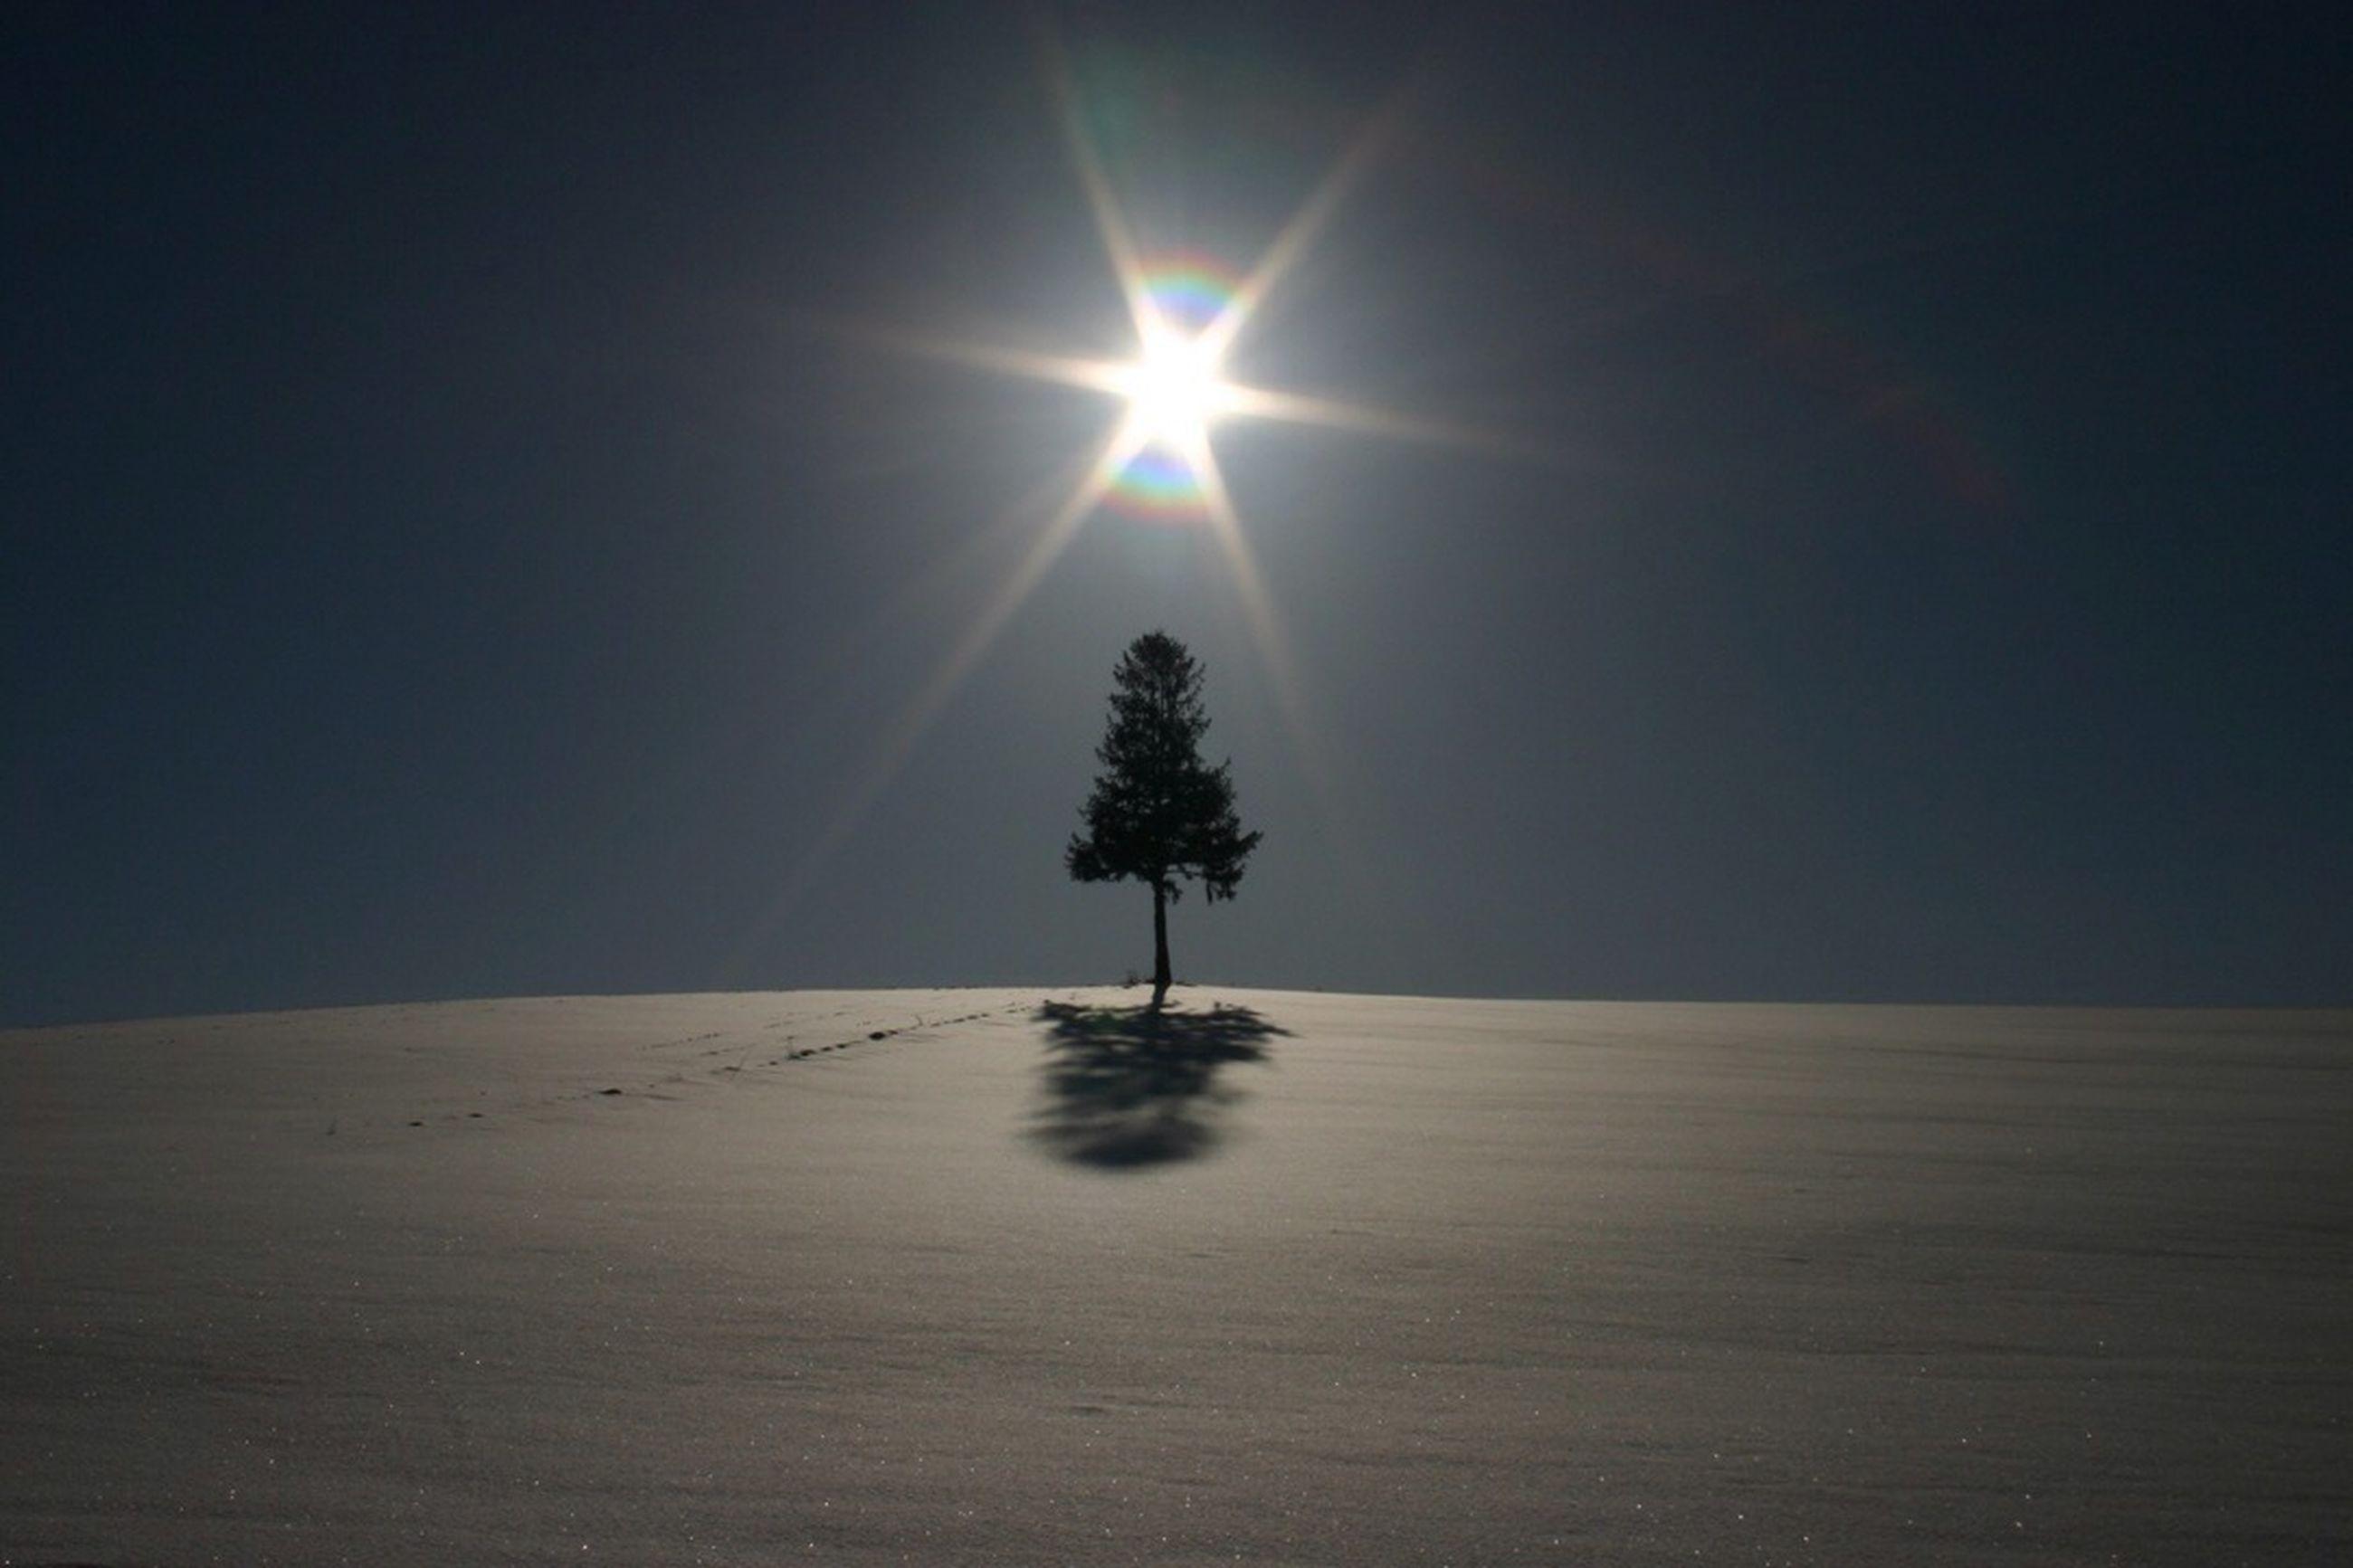 sun, snow, tranquility, tranquil scene, winter, cold temperature, sunbeam, sunlight, scenics, beauty in nature, nature, clear sky, lens flare, silhouette, landscape, season, bright, tree, idyllic, copy space